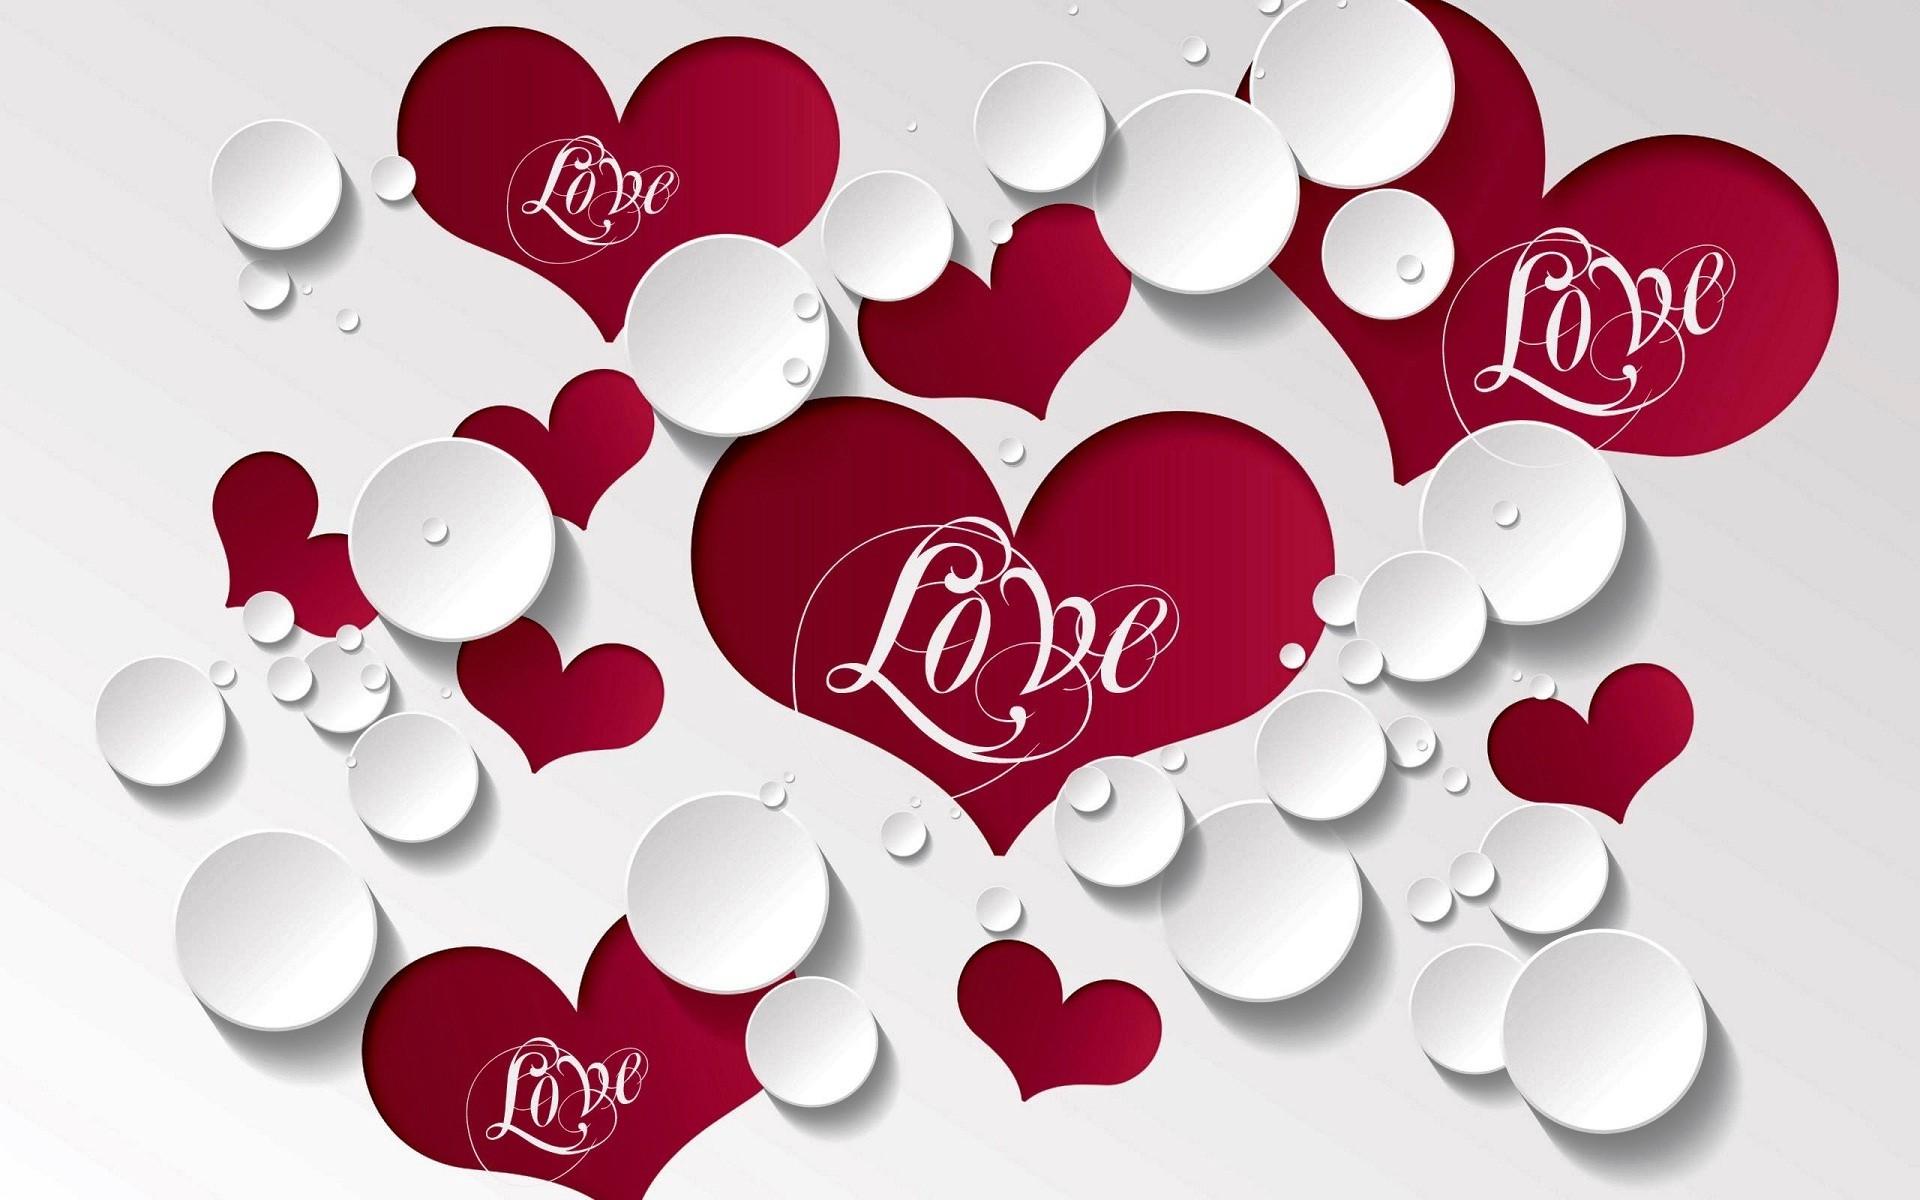 New Wallpaper Love